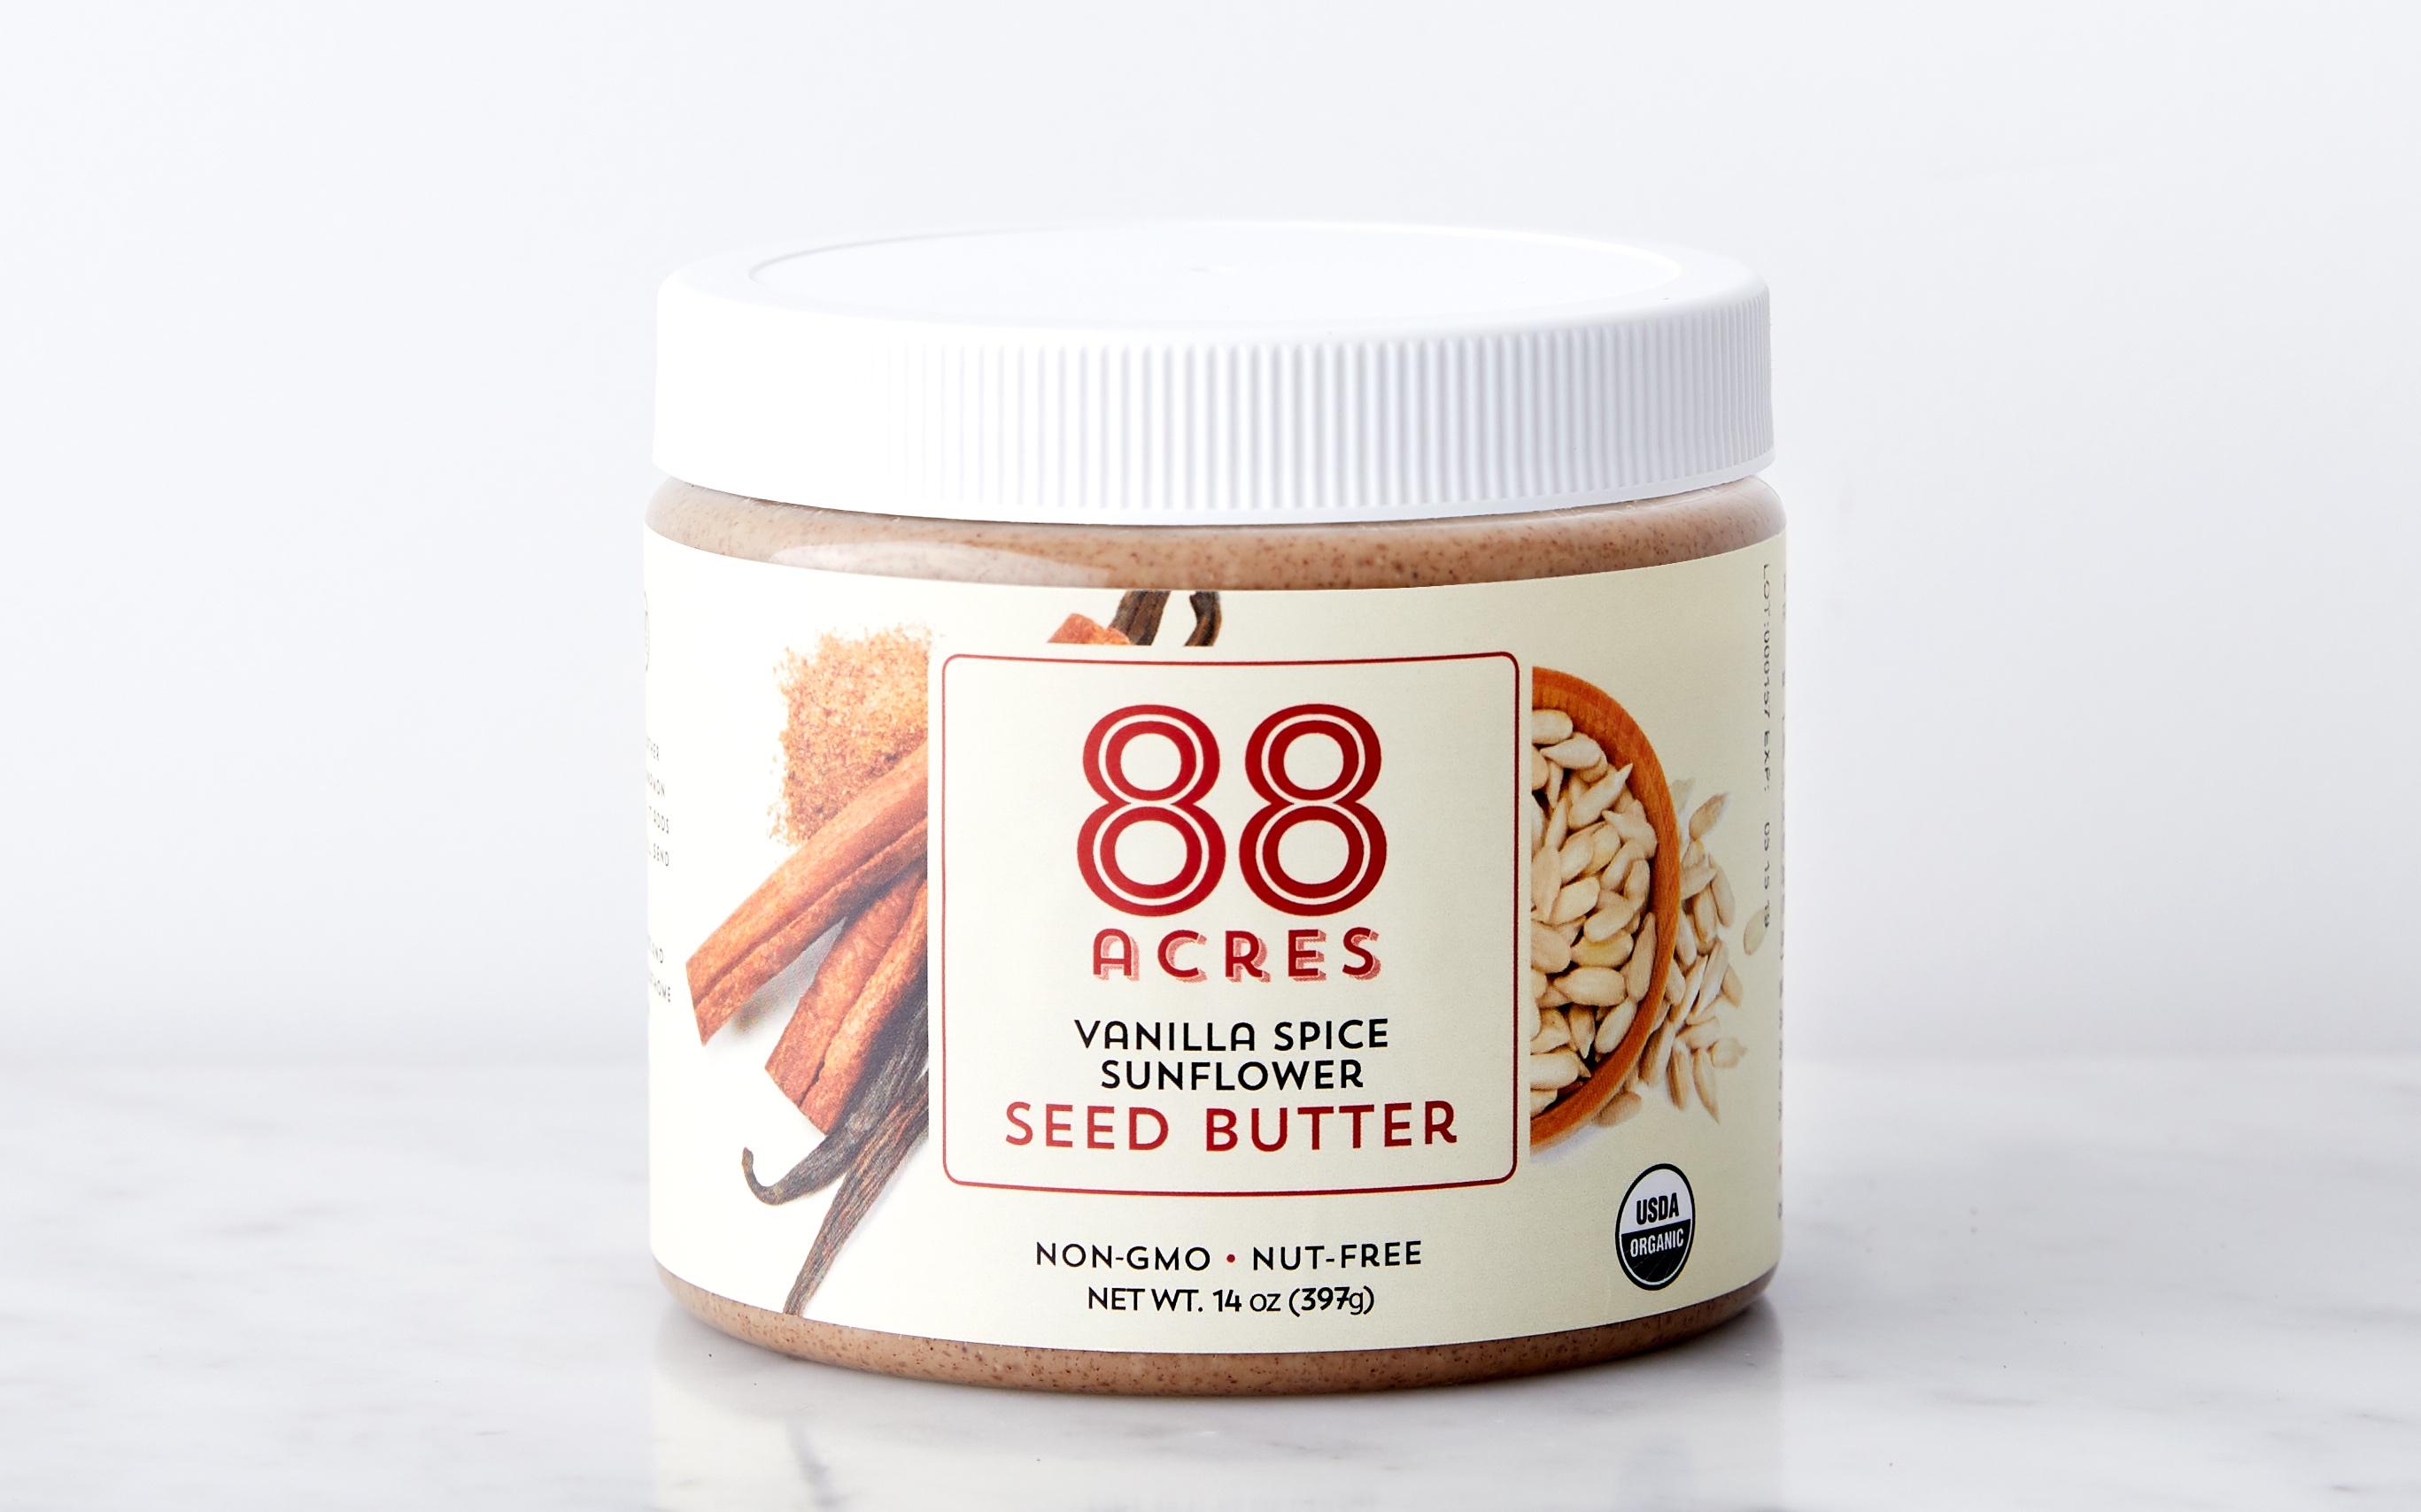 Organic Vanilla Spice Sunflower Seed Butter